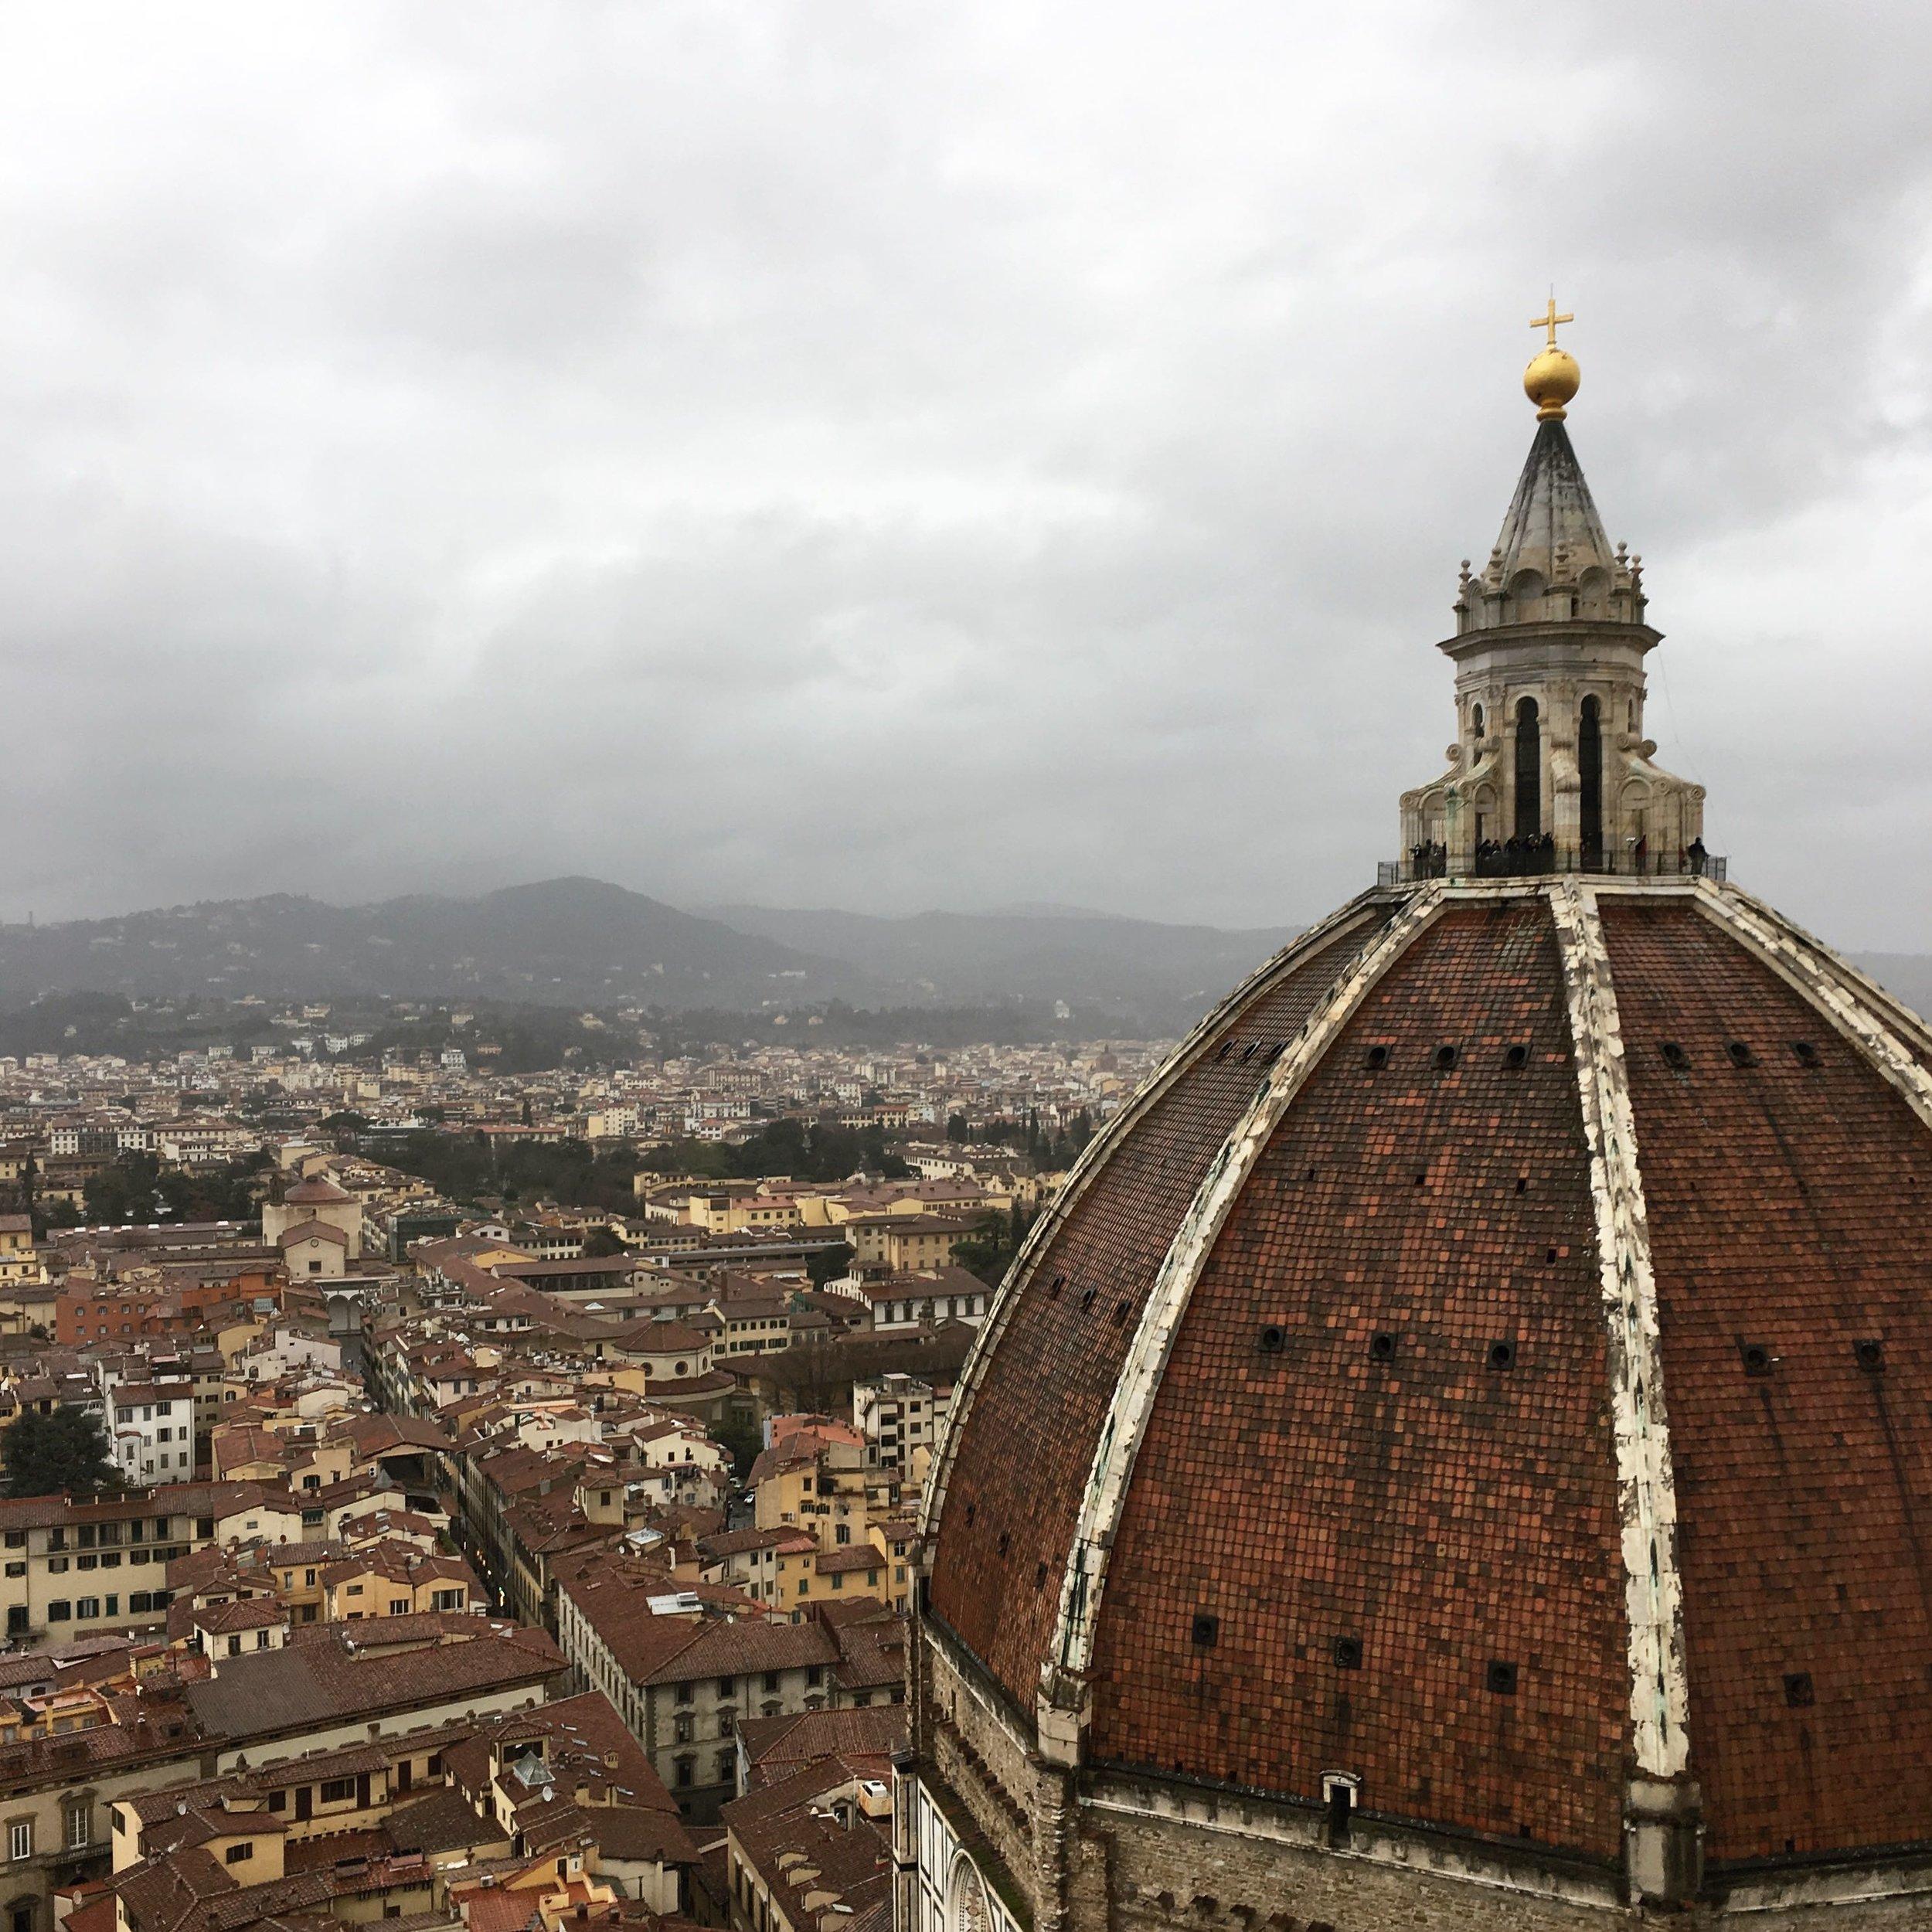 Lozidaze_Duomo_02